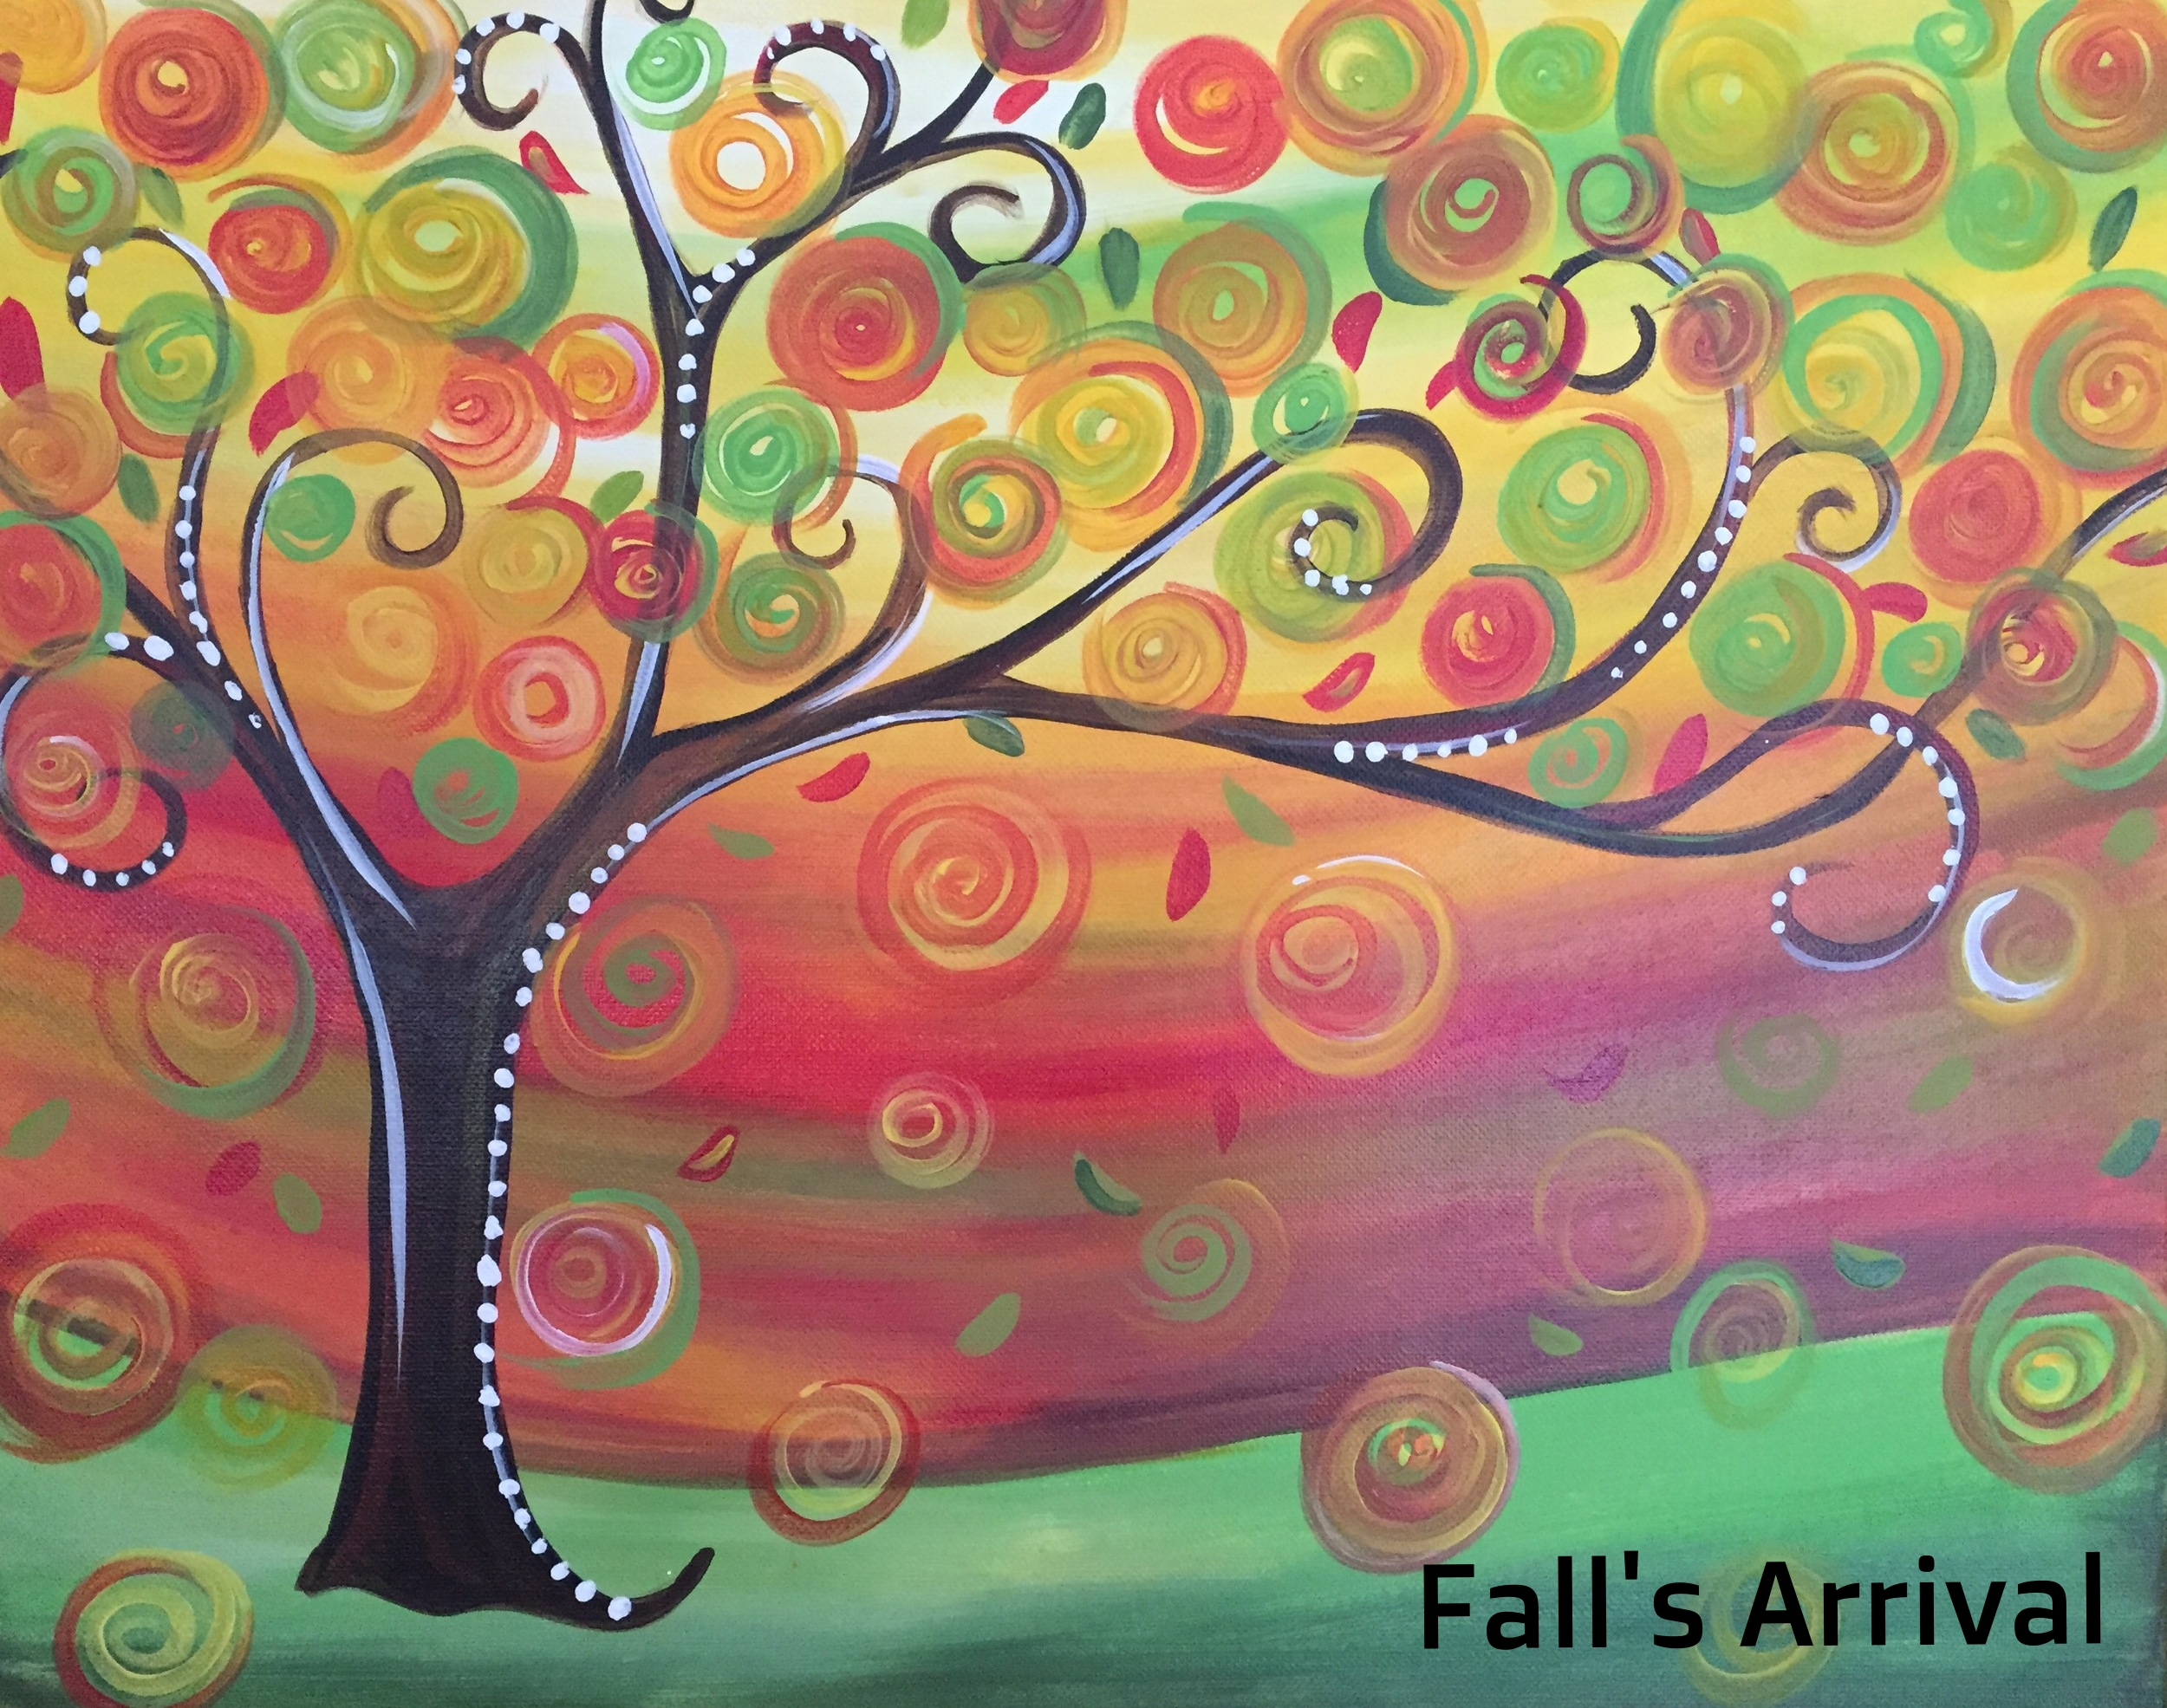 Fall's Arrival CW.jpg